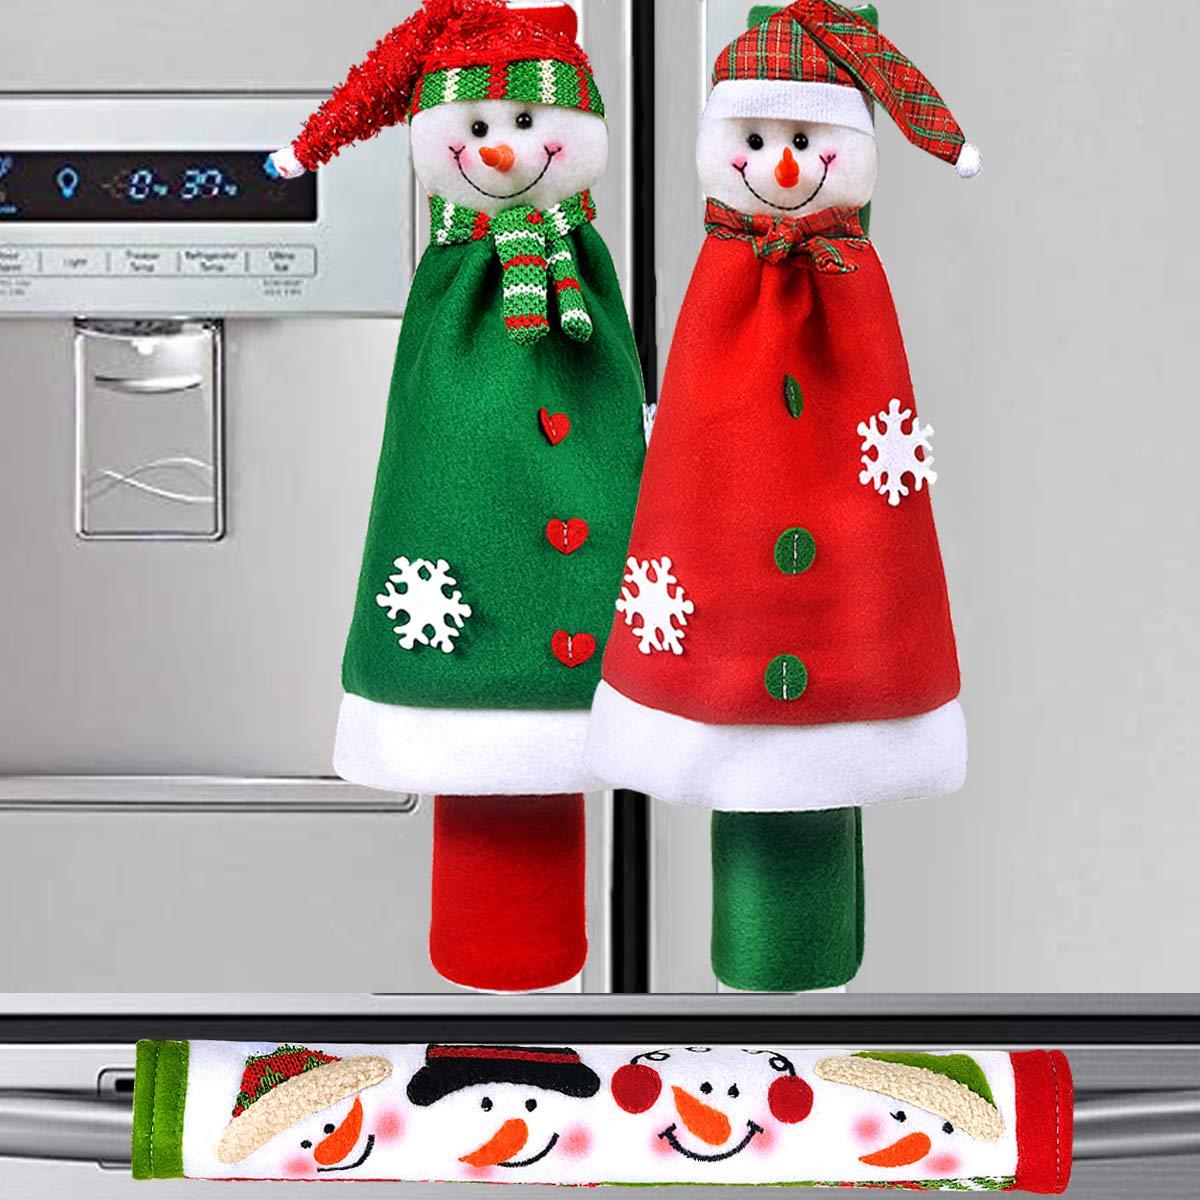 OUGAR8 Adorable Snowman Refrigerator Handle Covers Set | Cute &Practical Fridge Door Covers| Protective Kitchen Appliance Covers |Perfect Christmas Decorations Idea (3-Cloak)